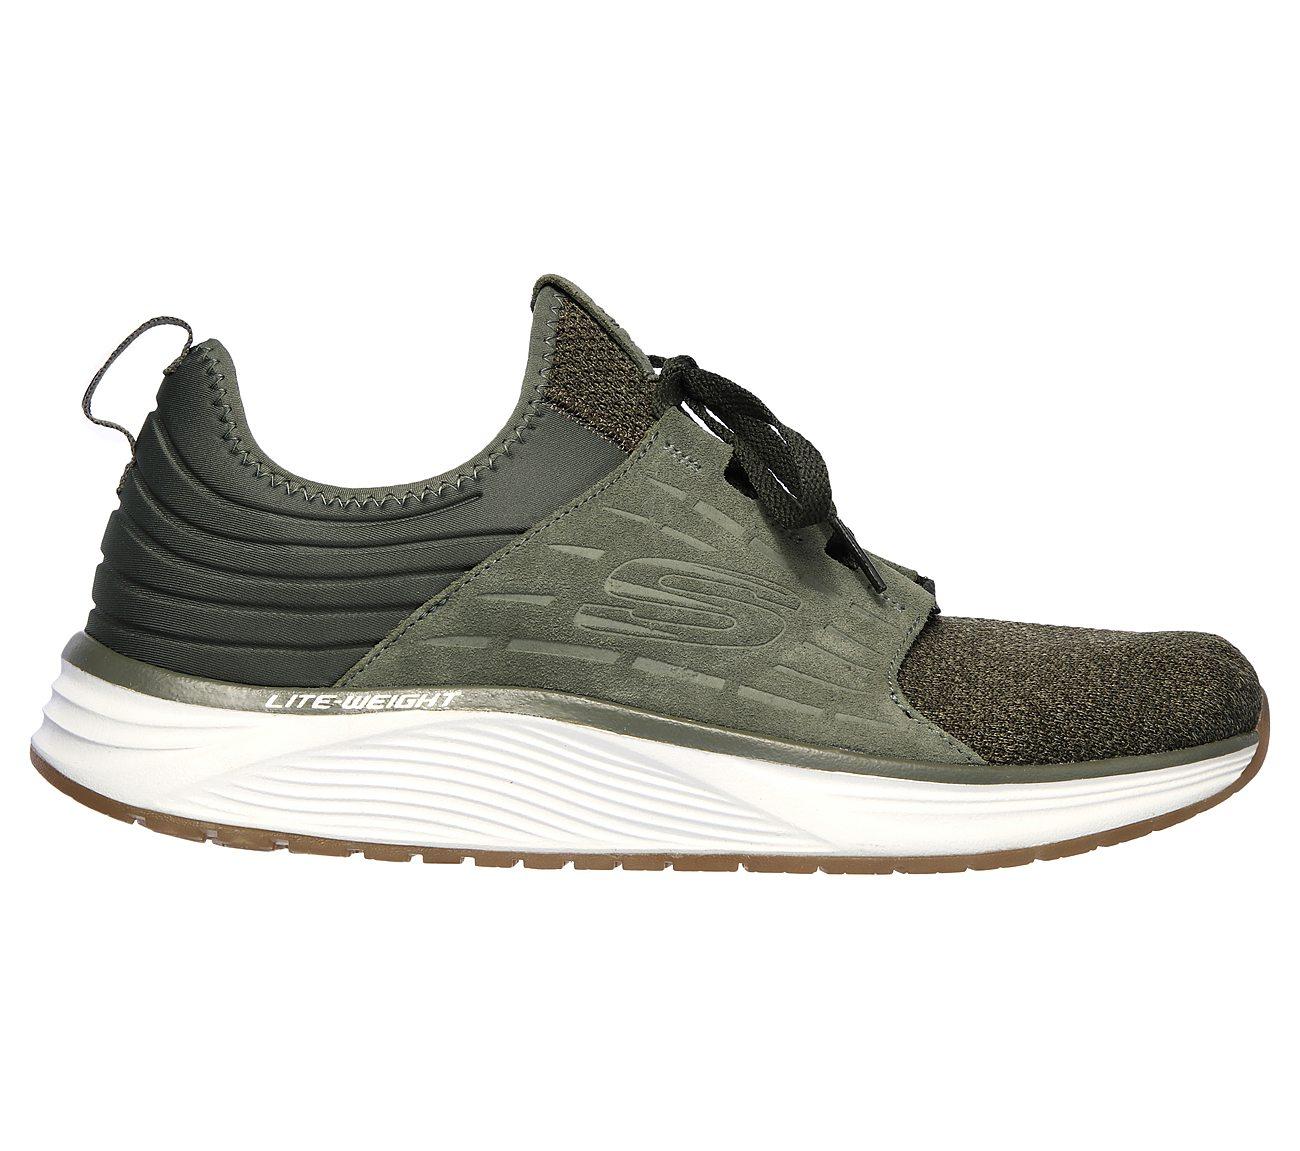 Buy SKECHERS Skyline - Silsher Sport Shoes